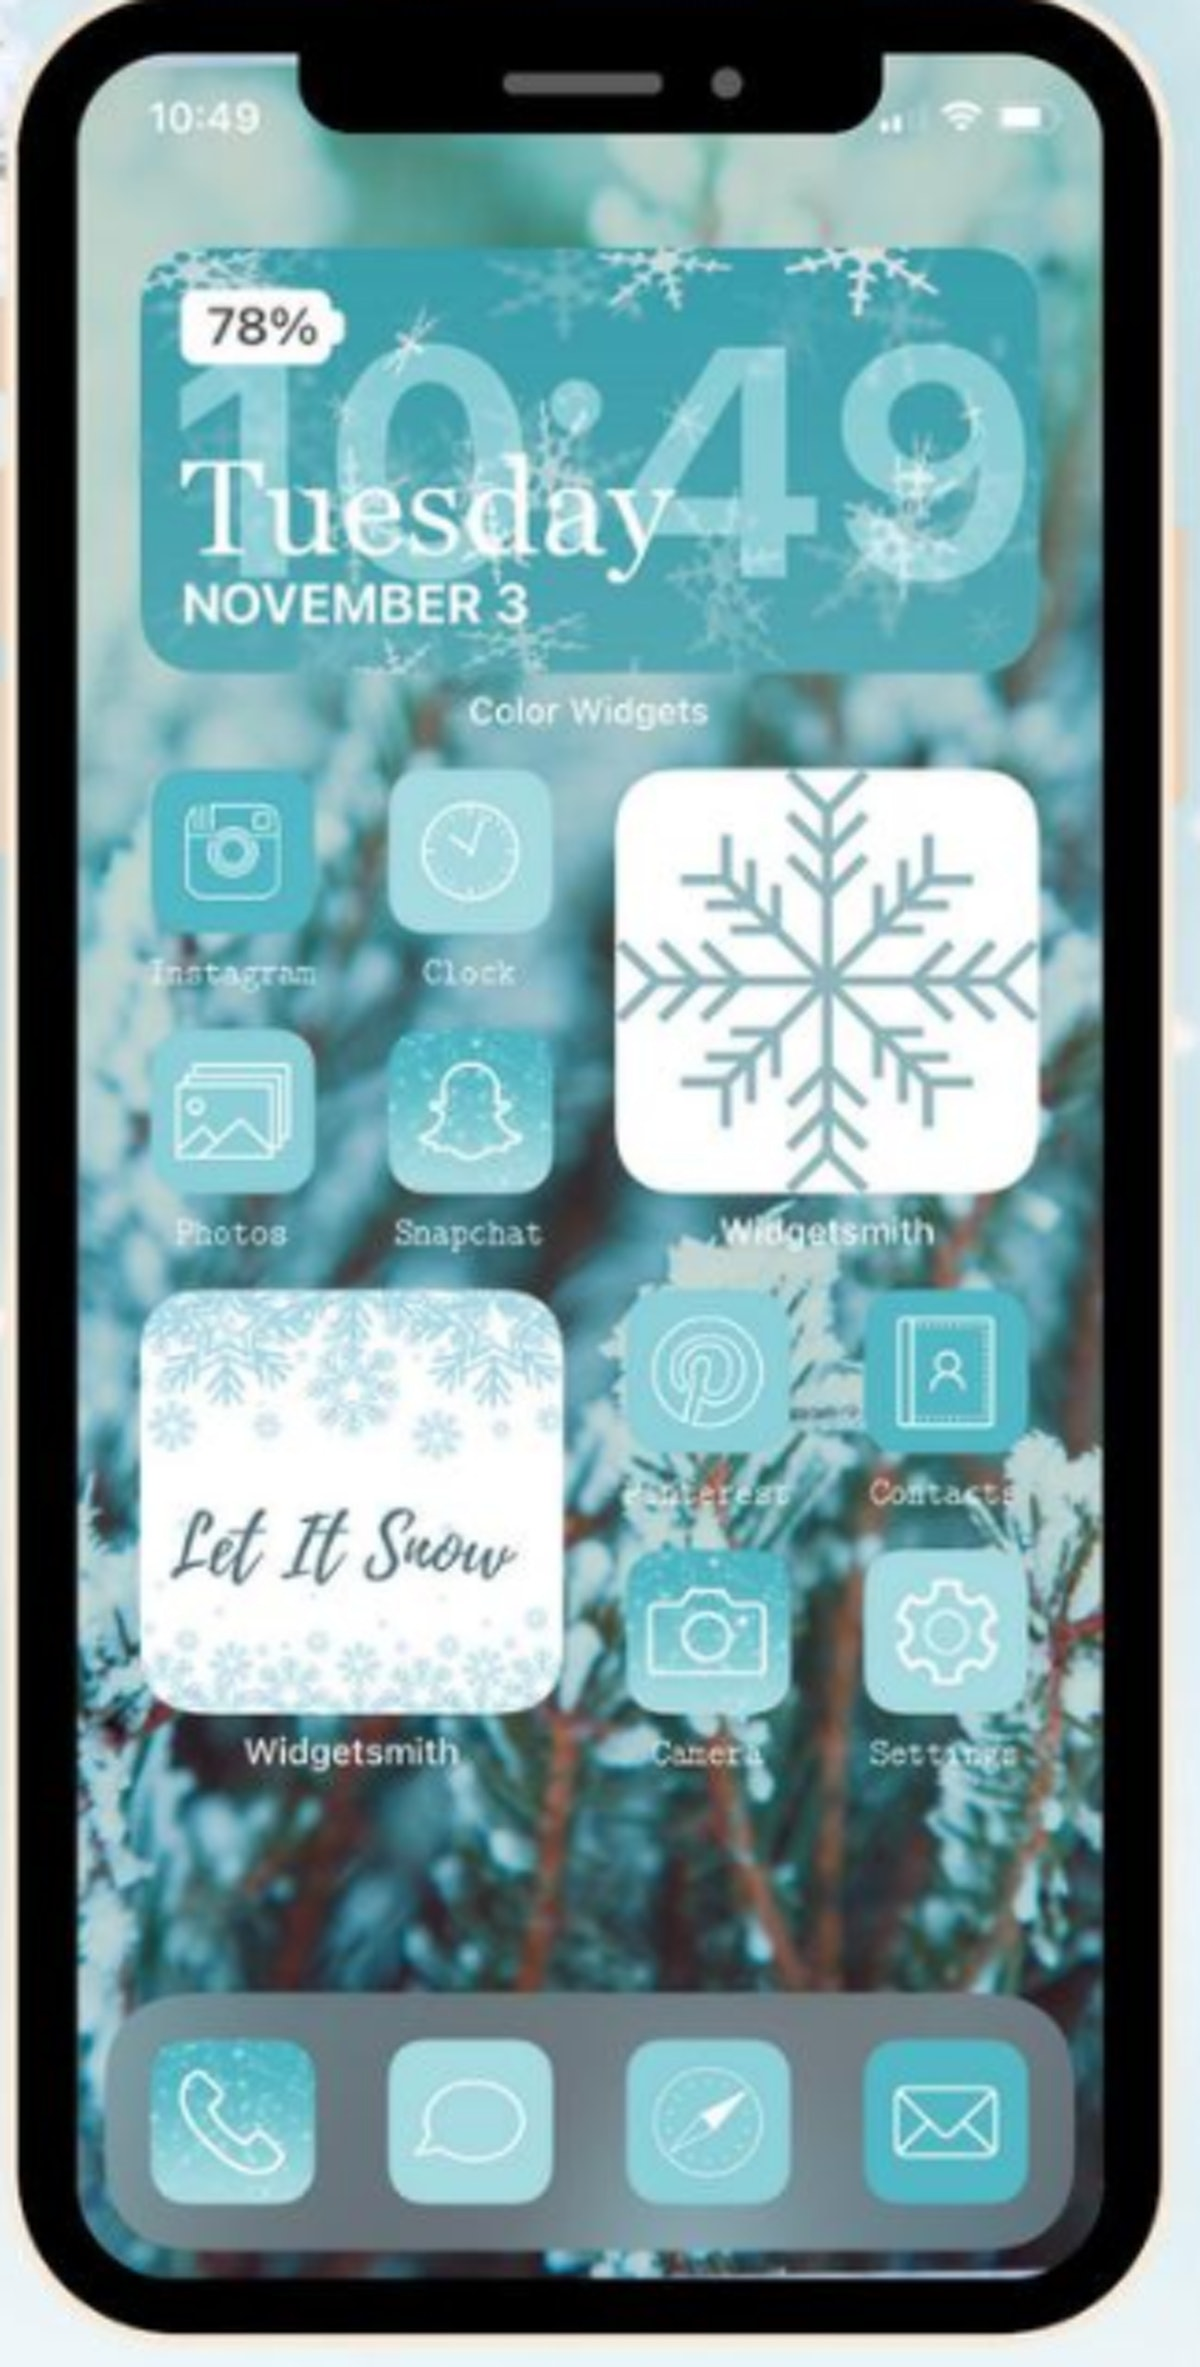 Winter Wonderland iOS 14 Home Screen Design